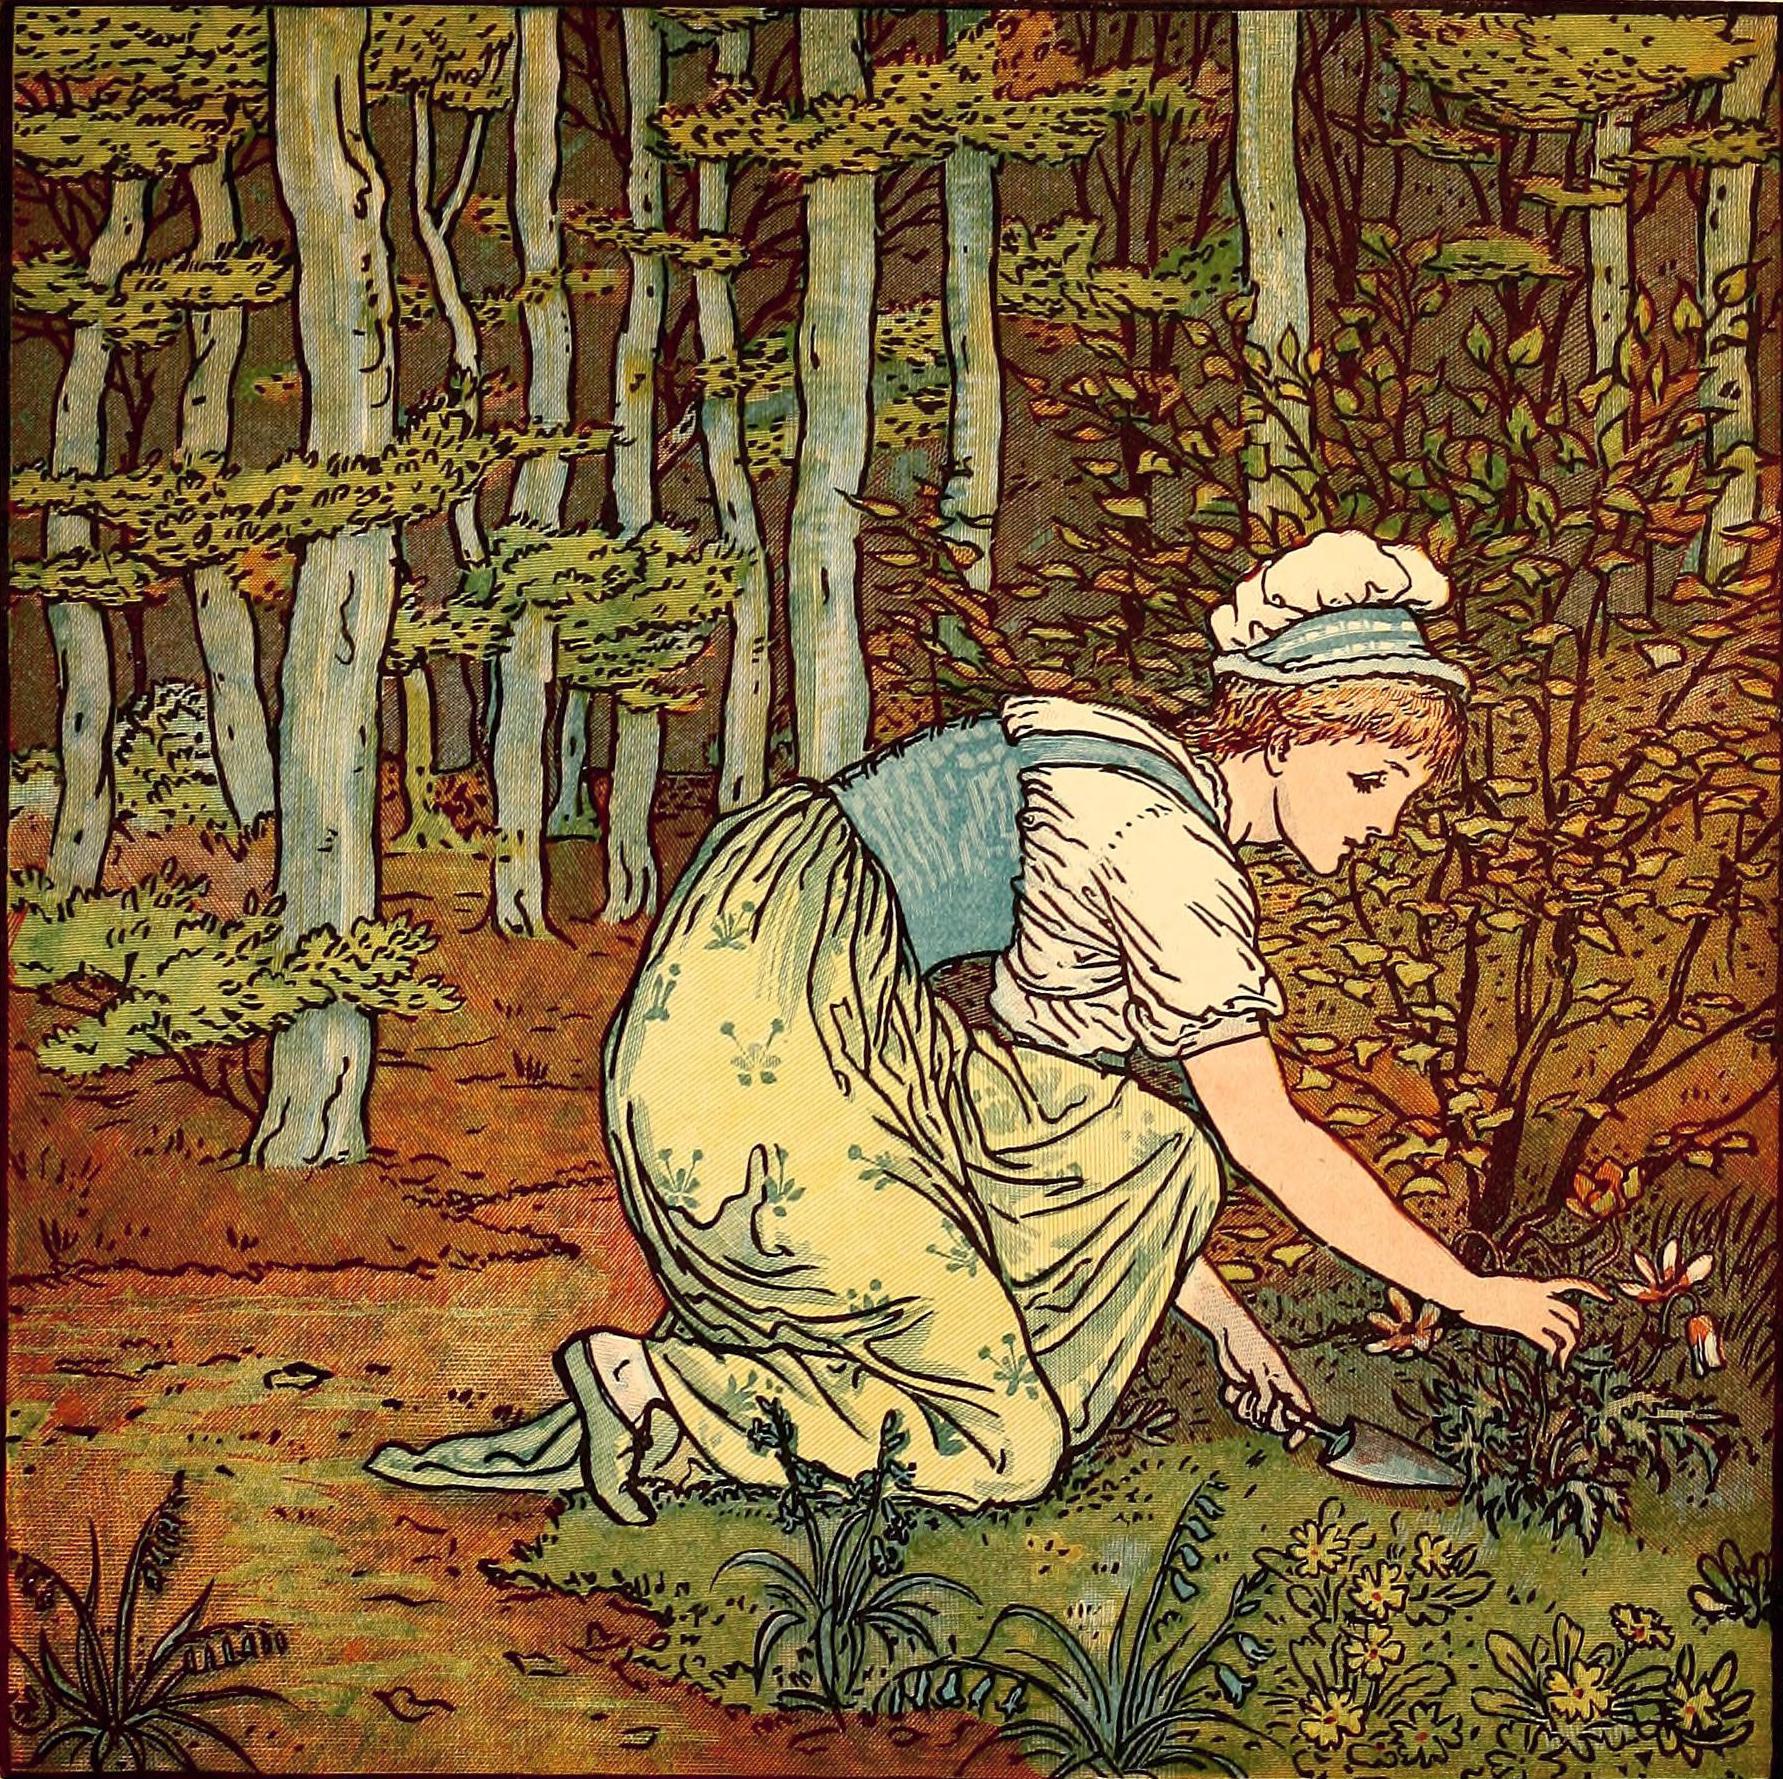 woman-gardening-color-illustration-by-walter-crane-circa-1889